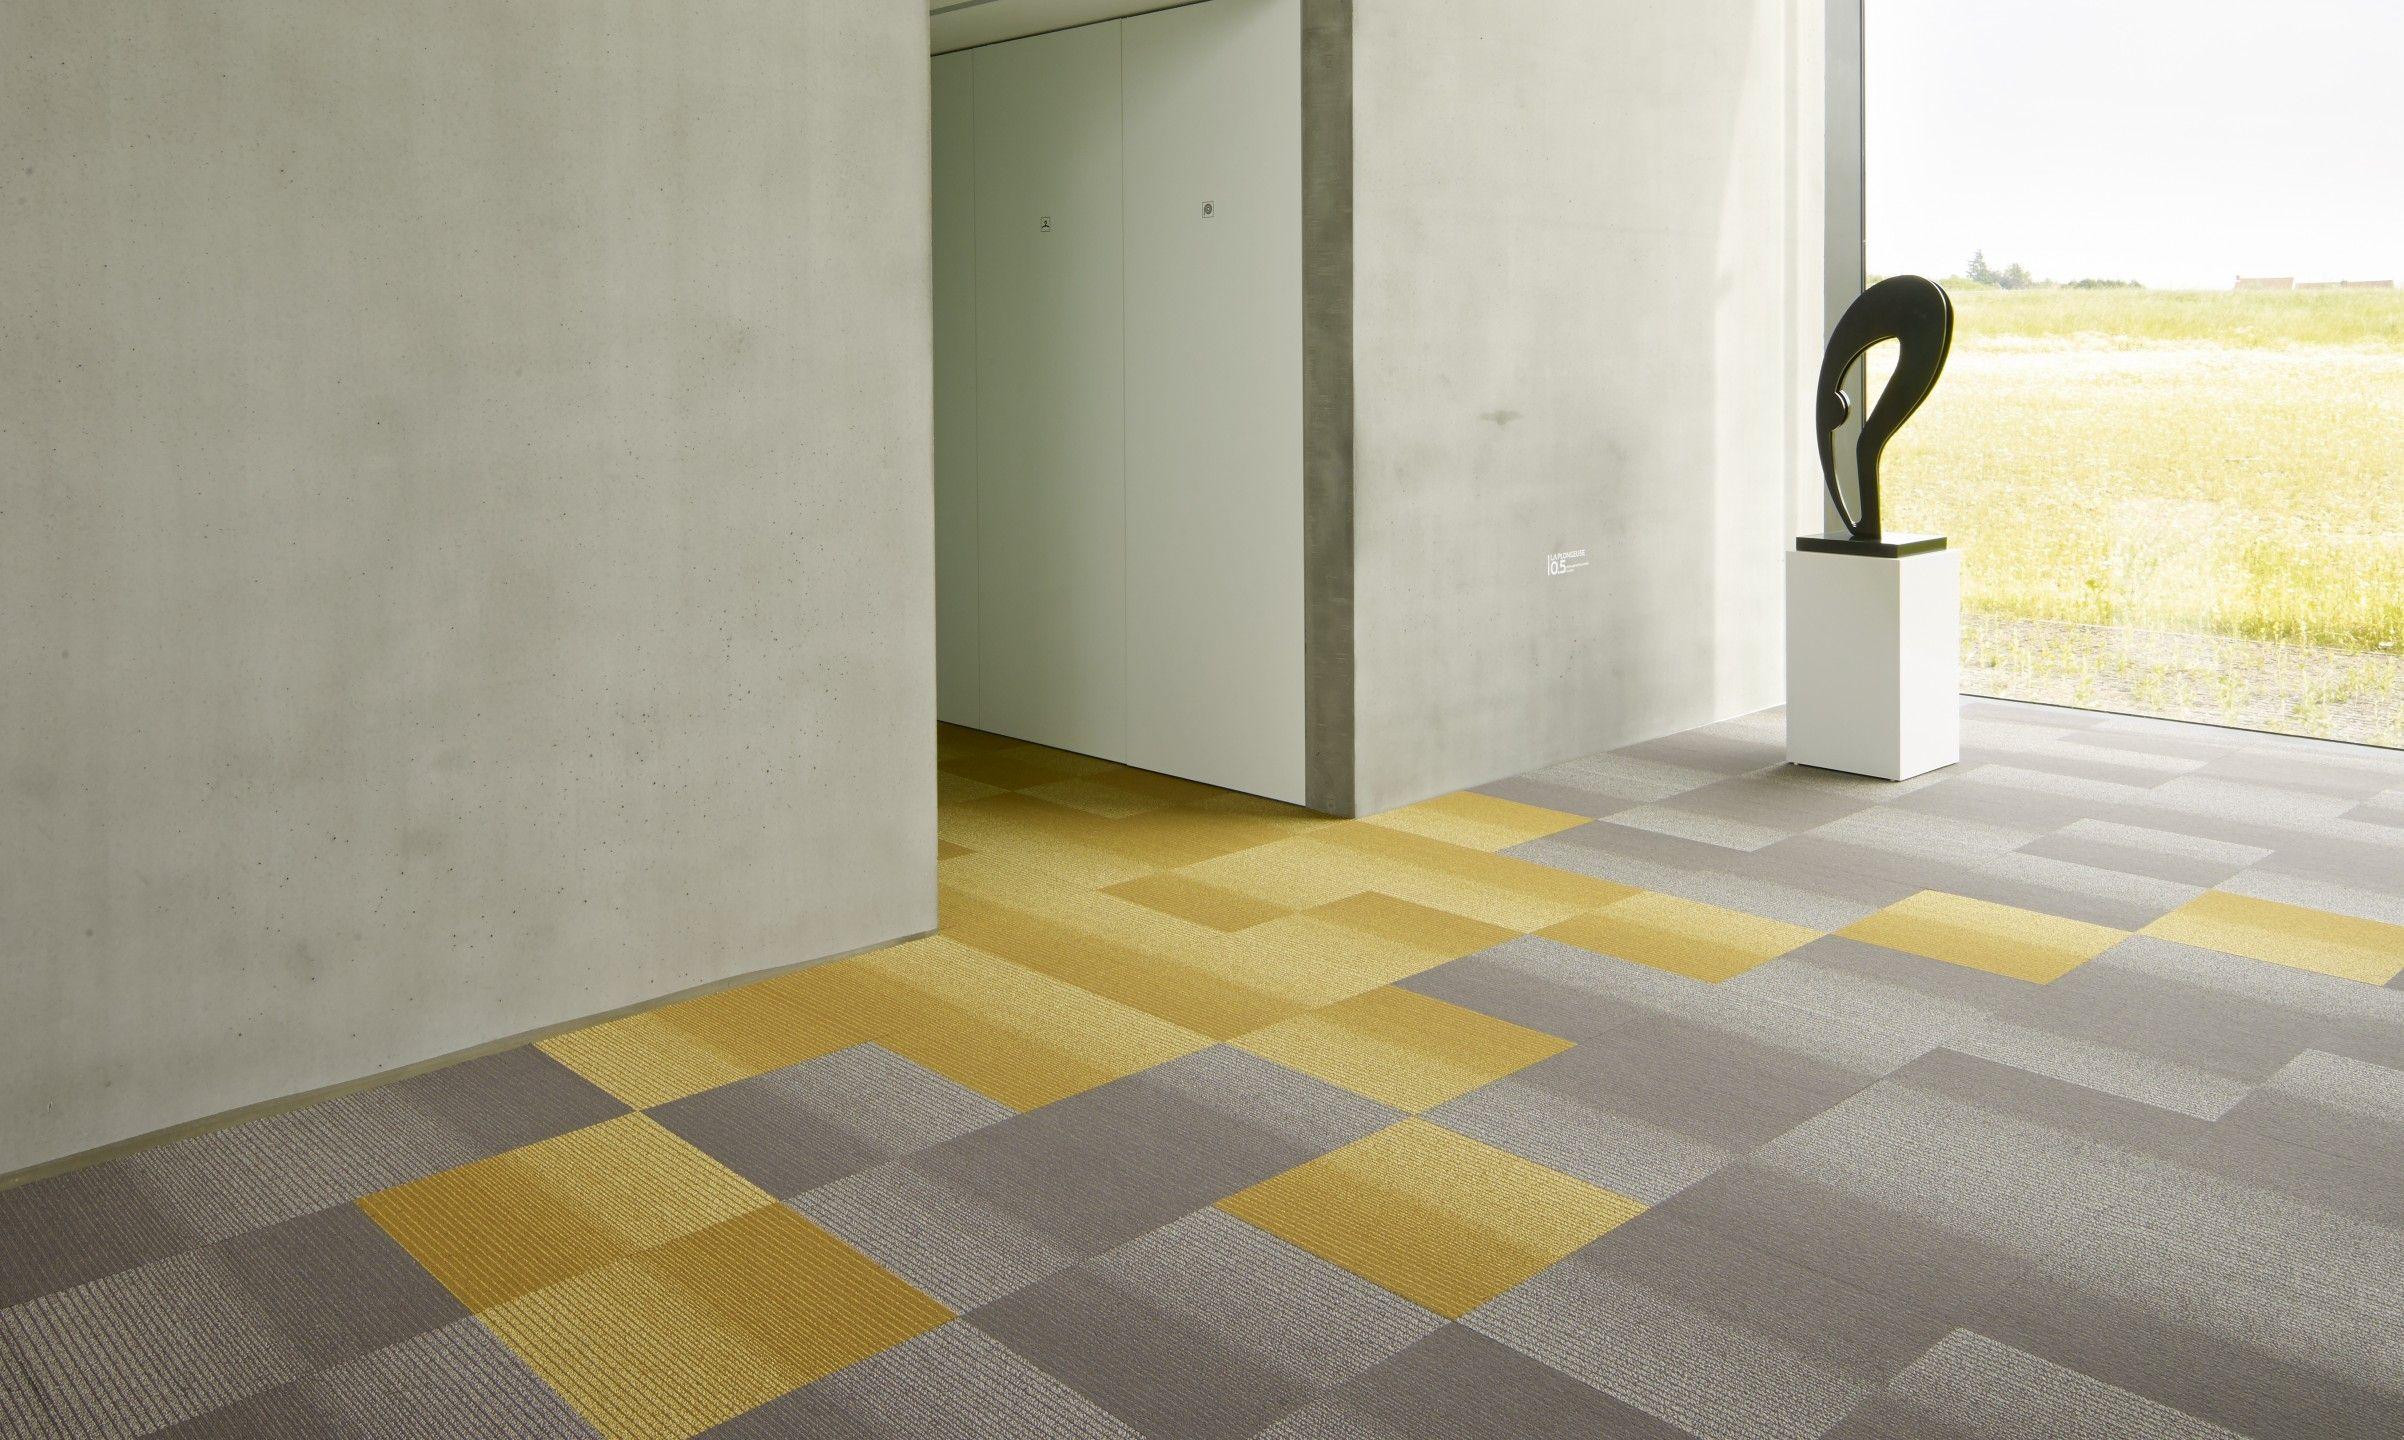 Charmant Commercial Carpet Suppliers, Office Carpet Tile: Selby Carpets